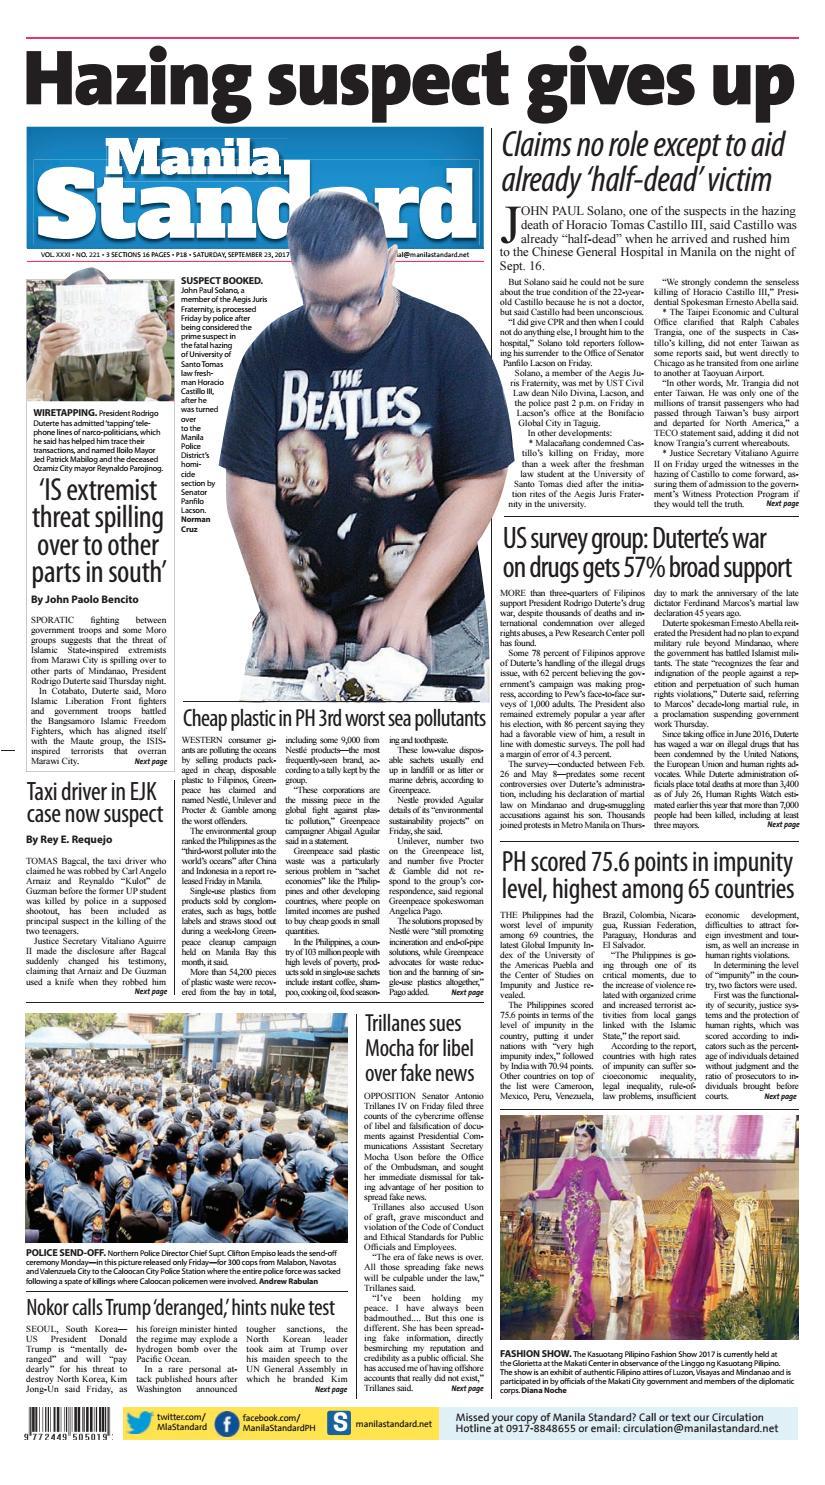 Manila Standard - 2017 September 23 - Saturday by Manila Standard